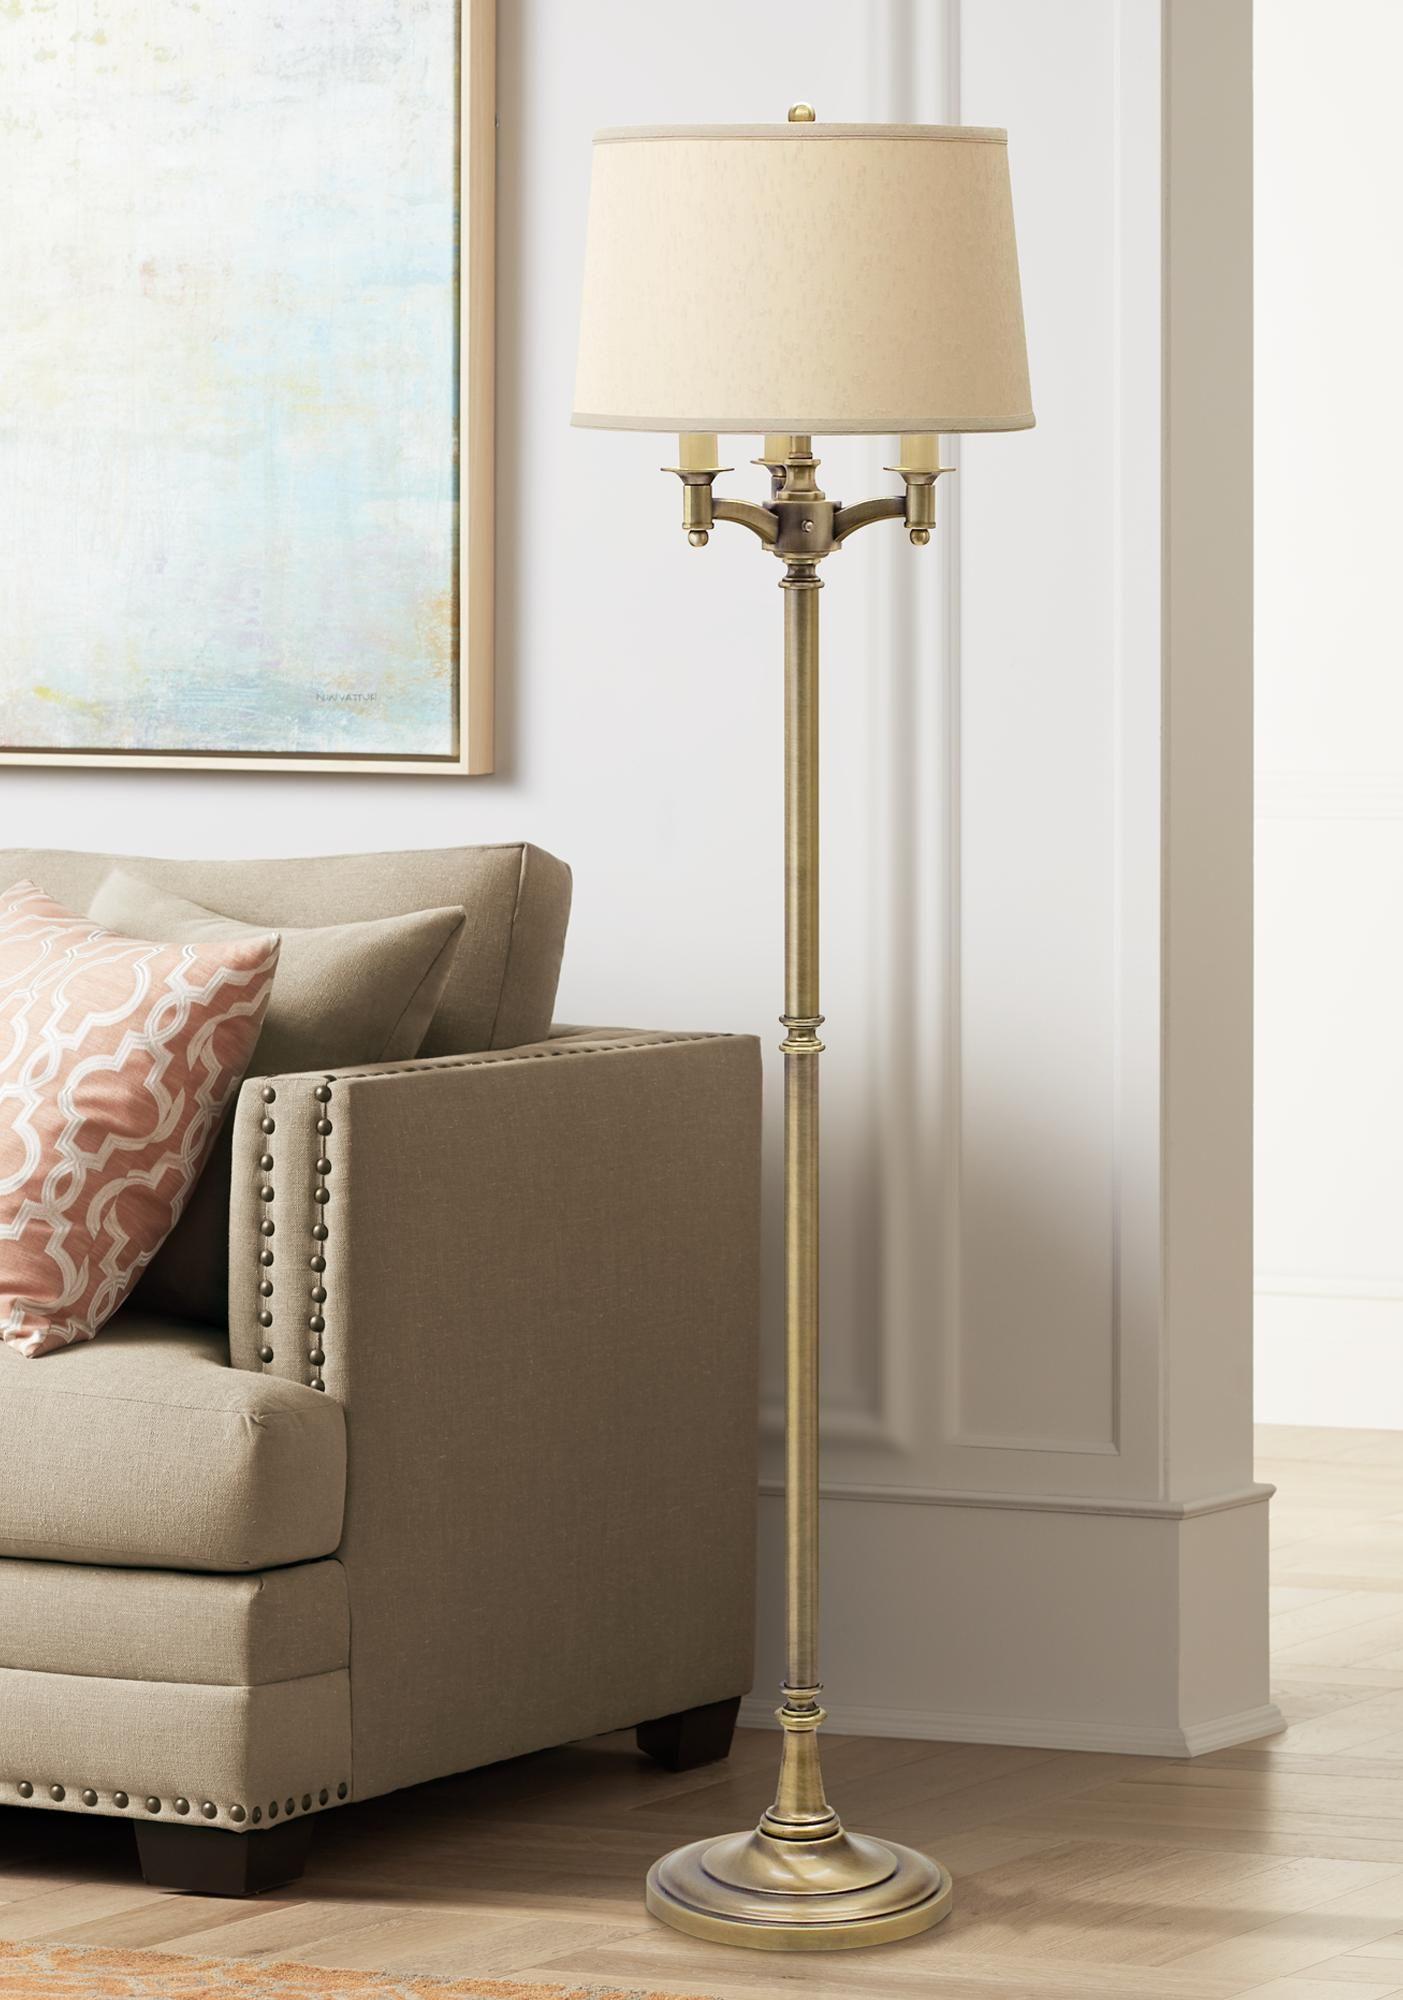 Floor Lamps House Of Troy Lancaster 6 Way Antique Brass Floor Lamp In 2020 House Of Troy Brass Floor Lamp Floor Lamp